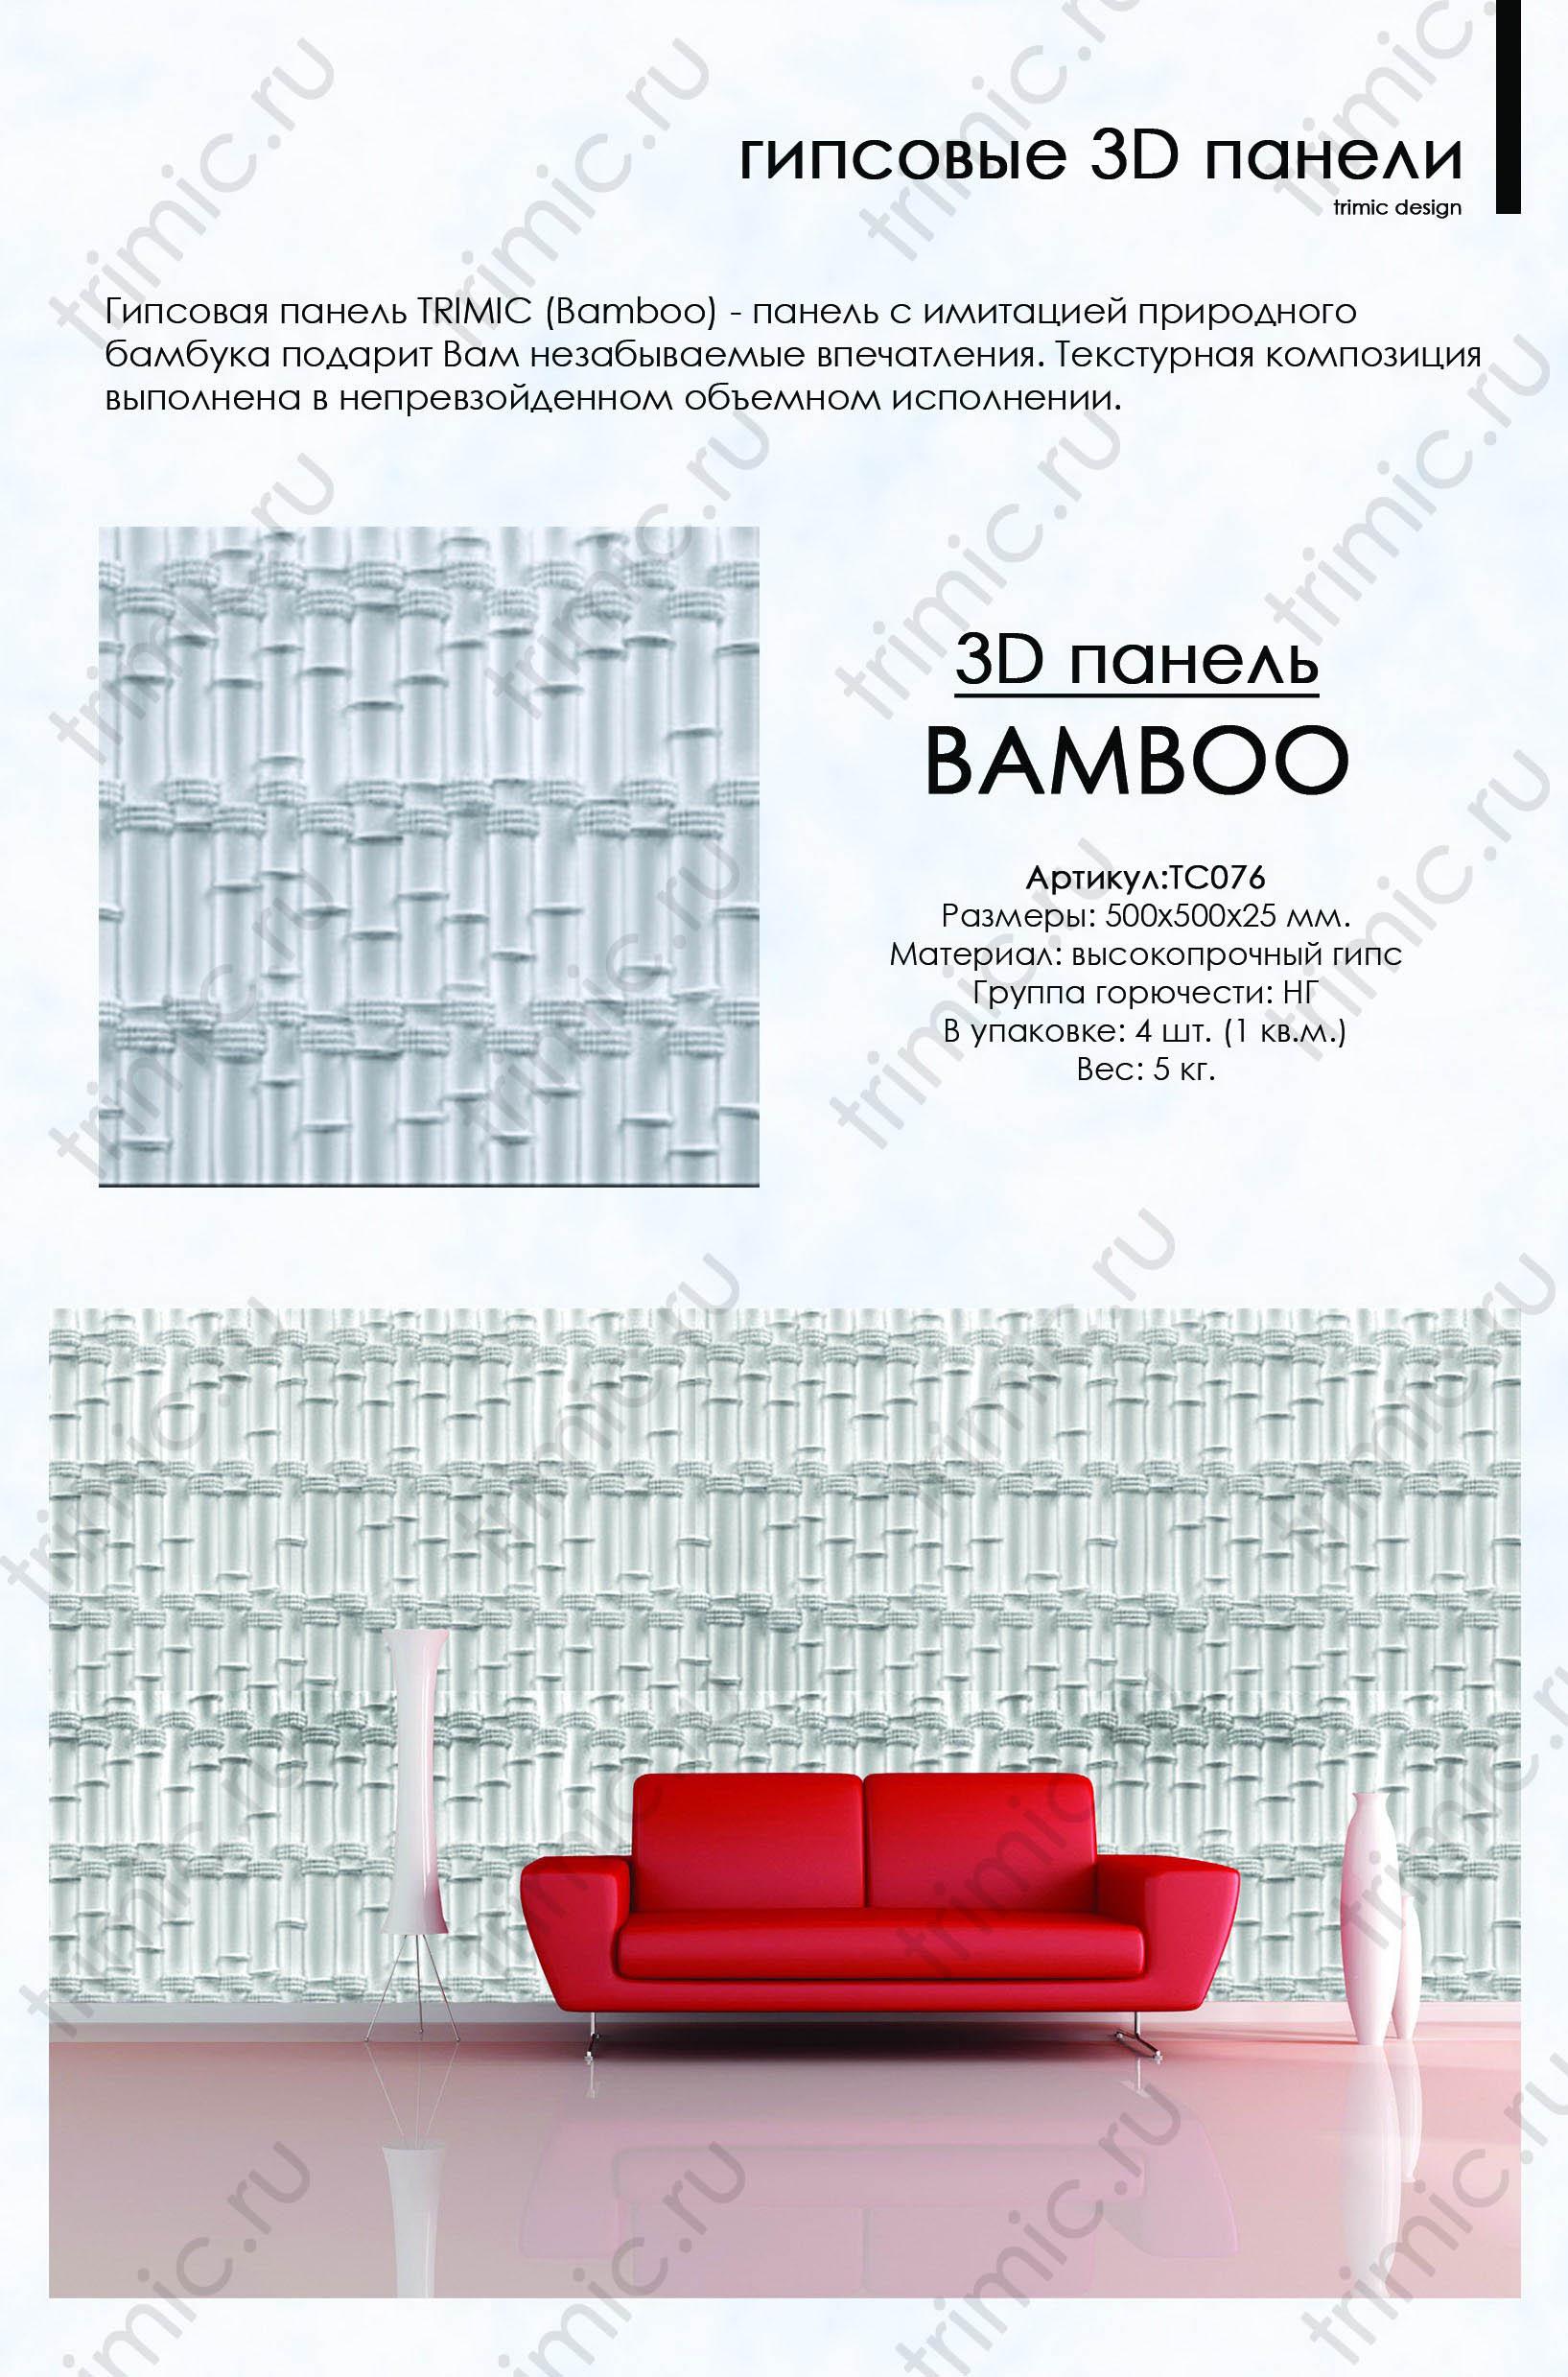 "3D панель ""BAMBOO"",гипсовые панели для дизайна, декор стен, красивые стены, эко панели, отделка стен, красивые стены, панели от производителя, декоративные панели."